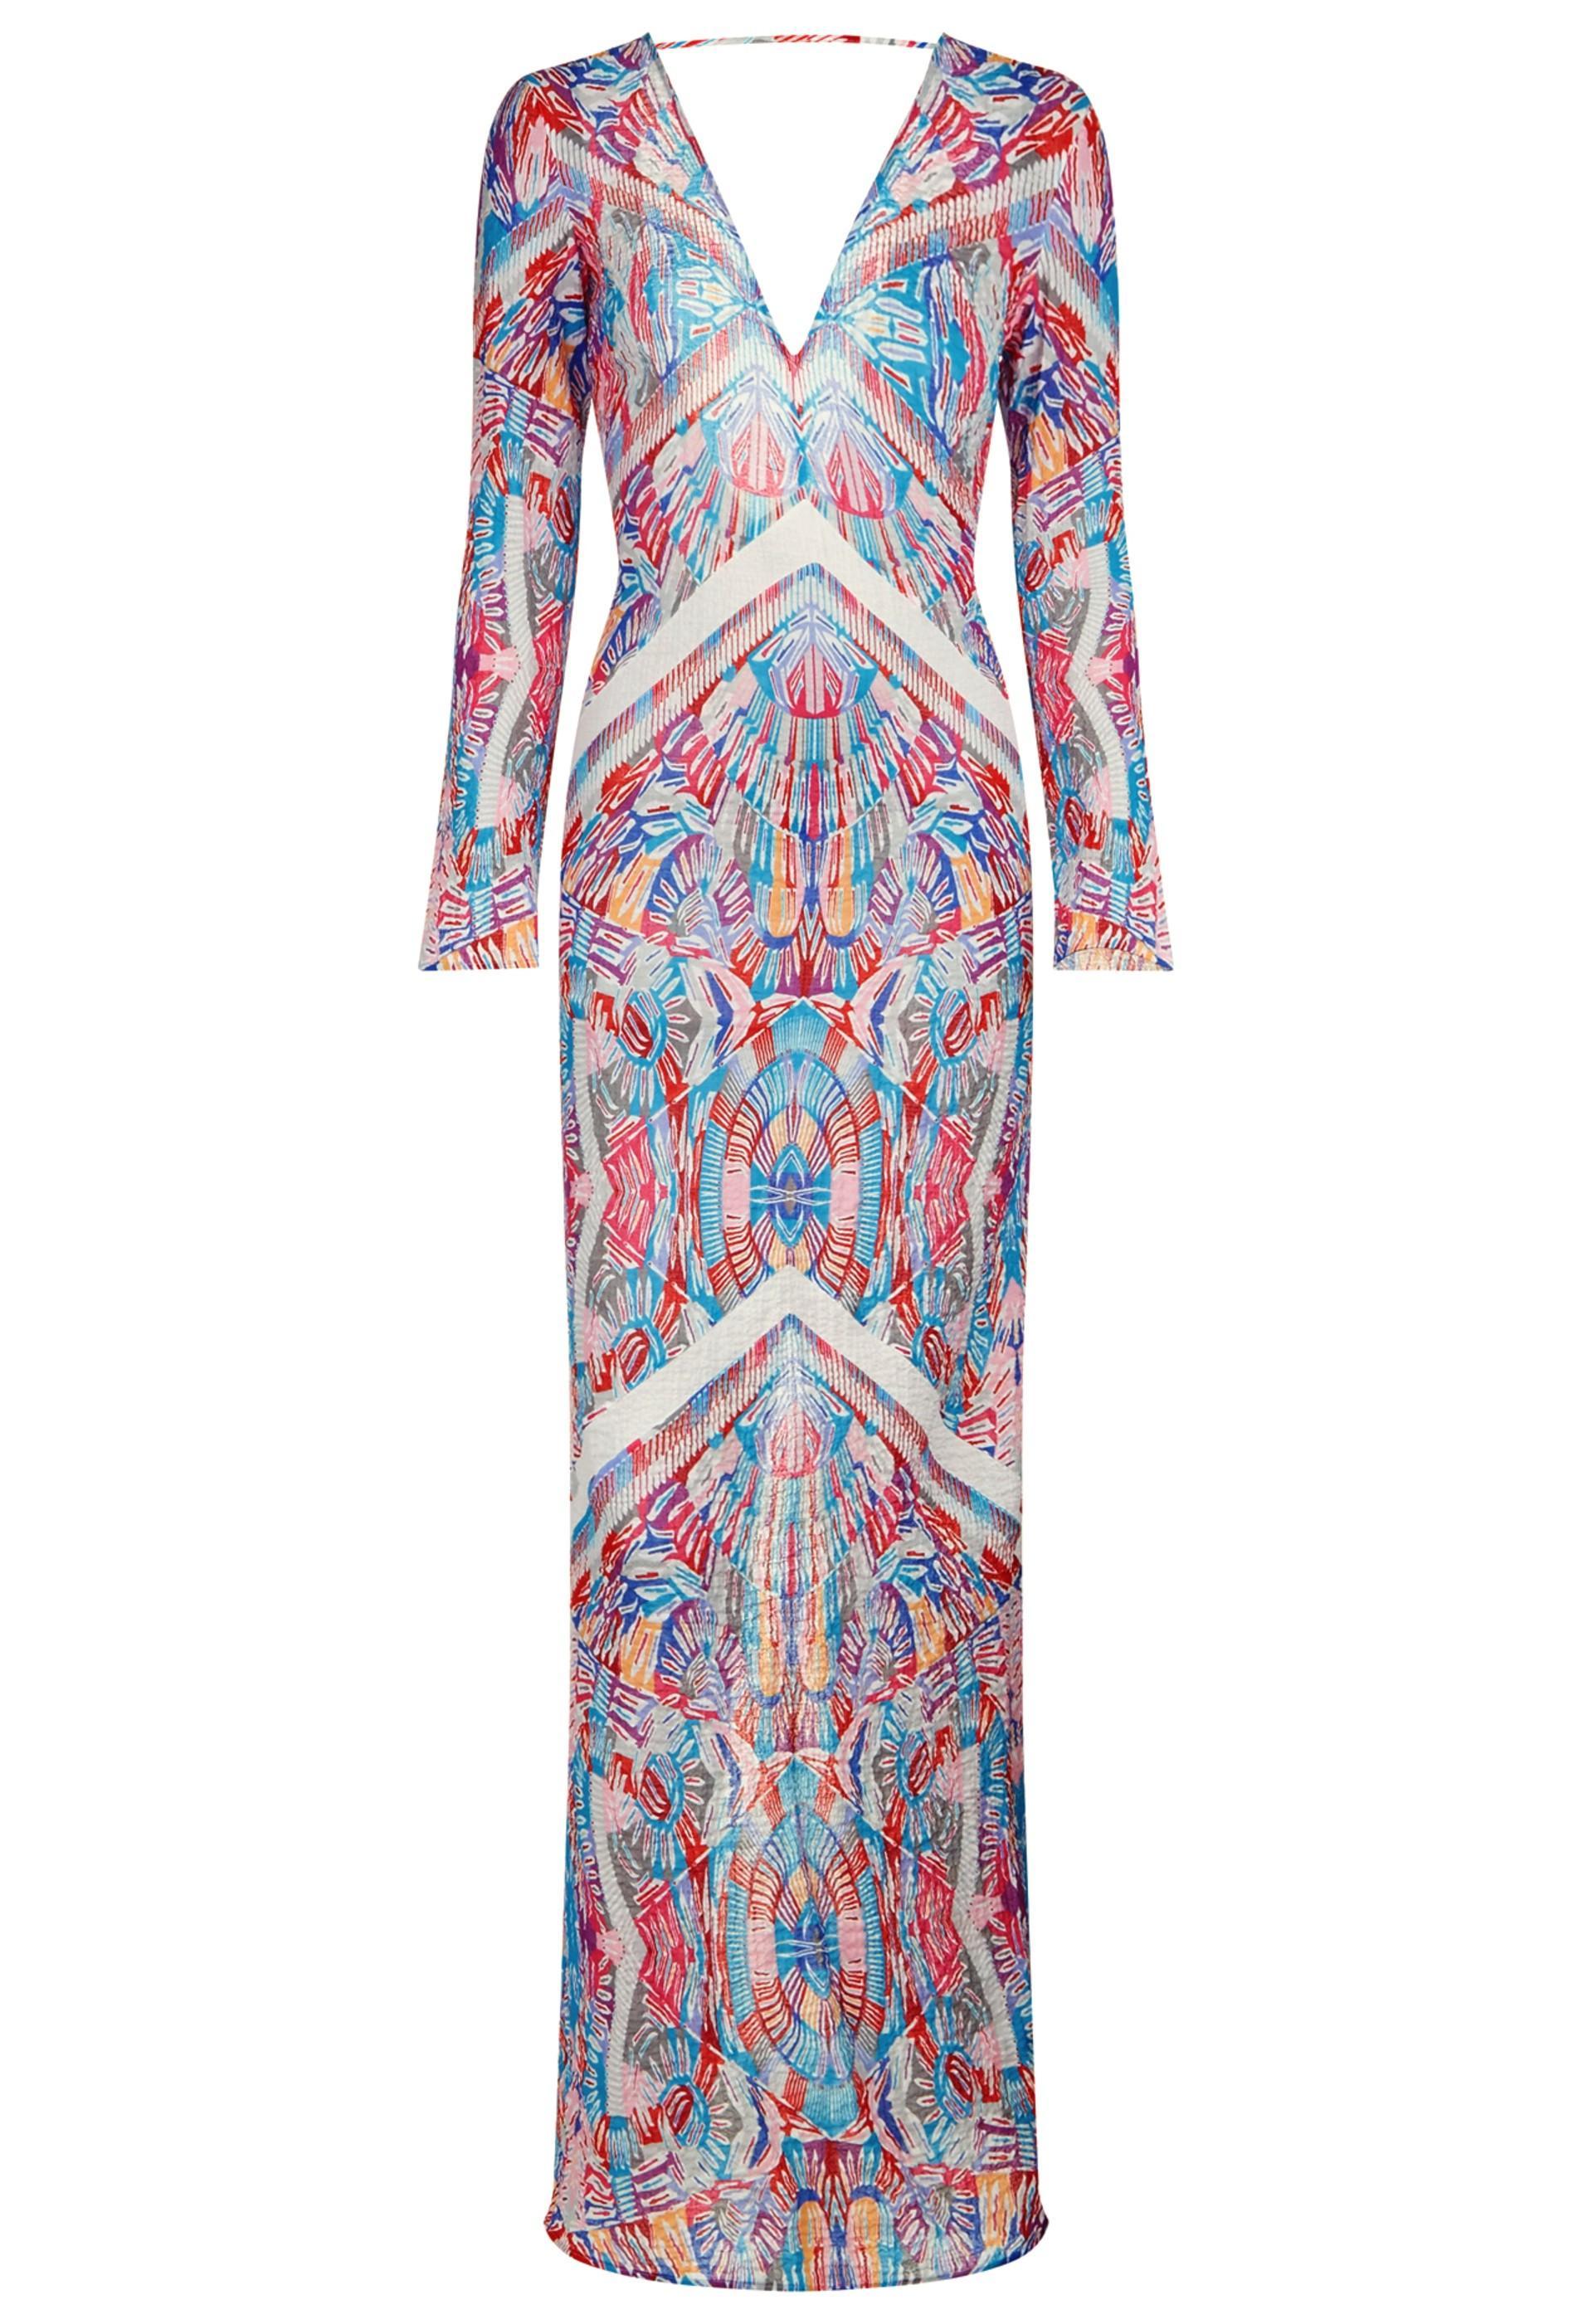 La Perla Free Spirit Long Sleeve Long Dress, Mosaic Print